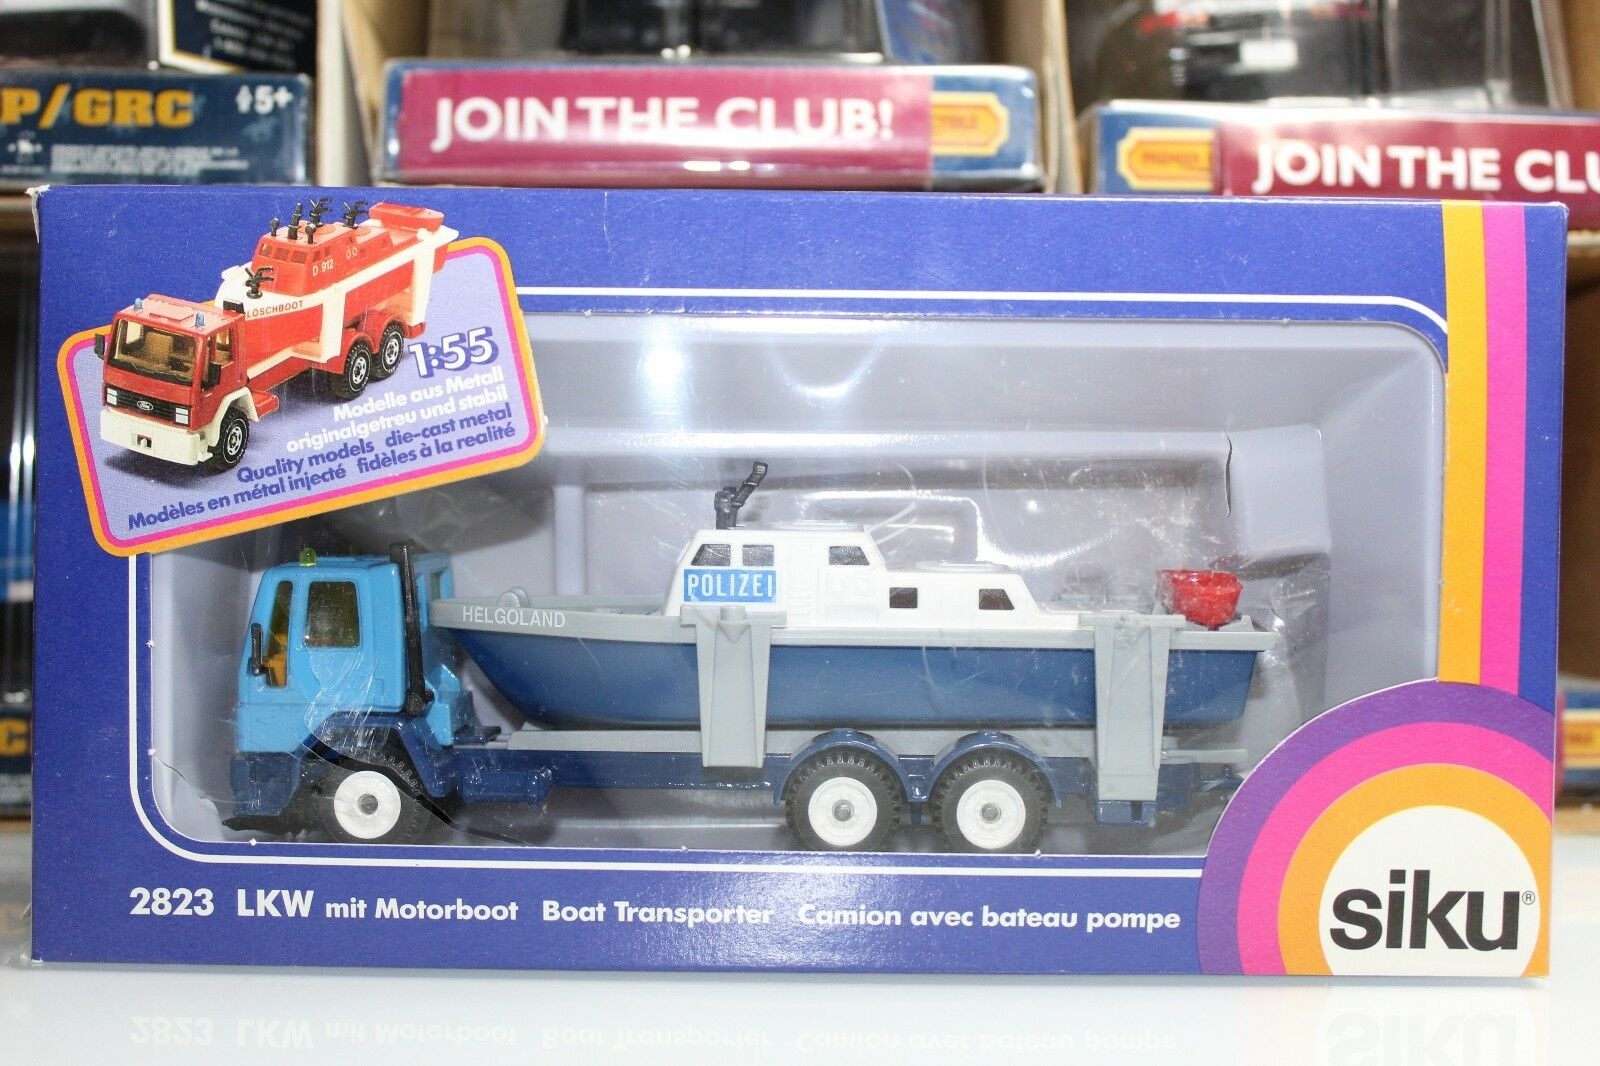 Siku Super Serie 1 55 Scale POLICE BOAT TRANSPORTER  2823